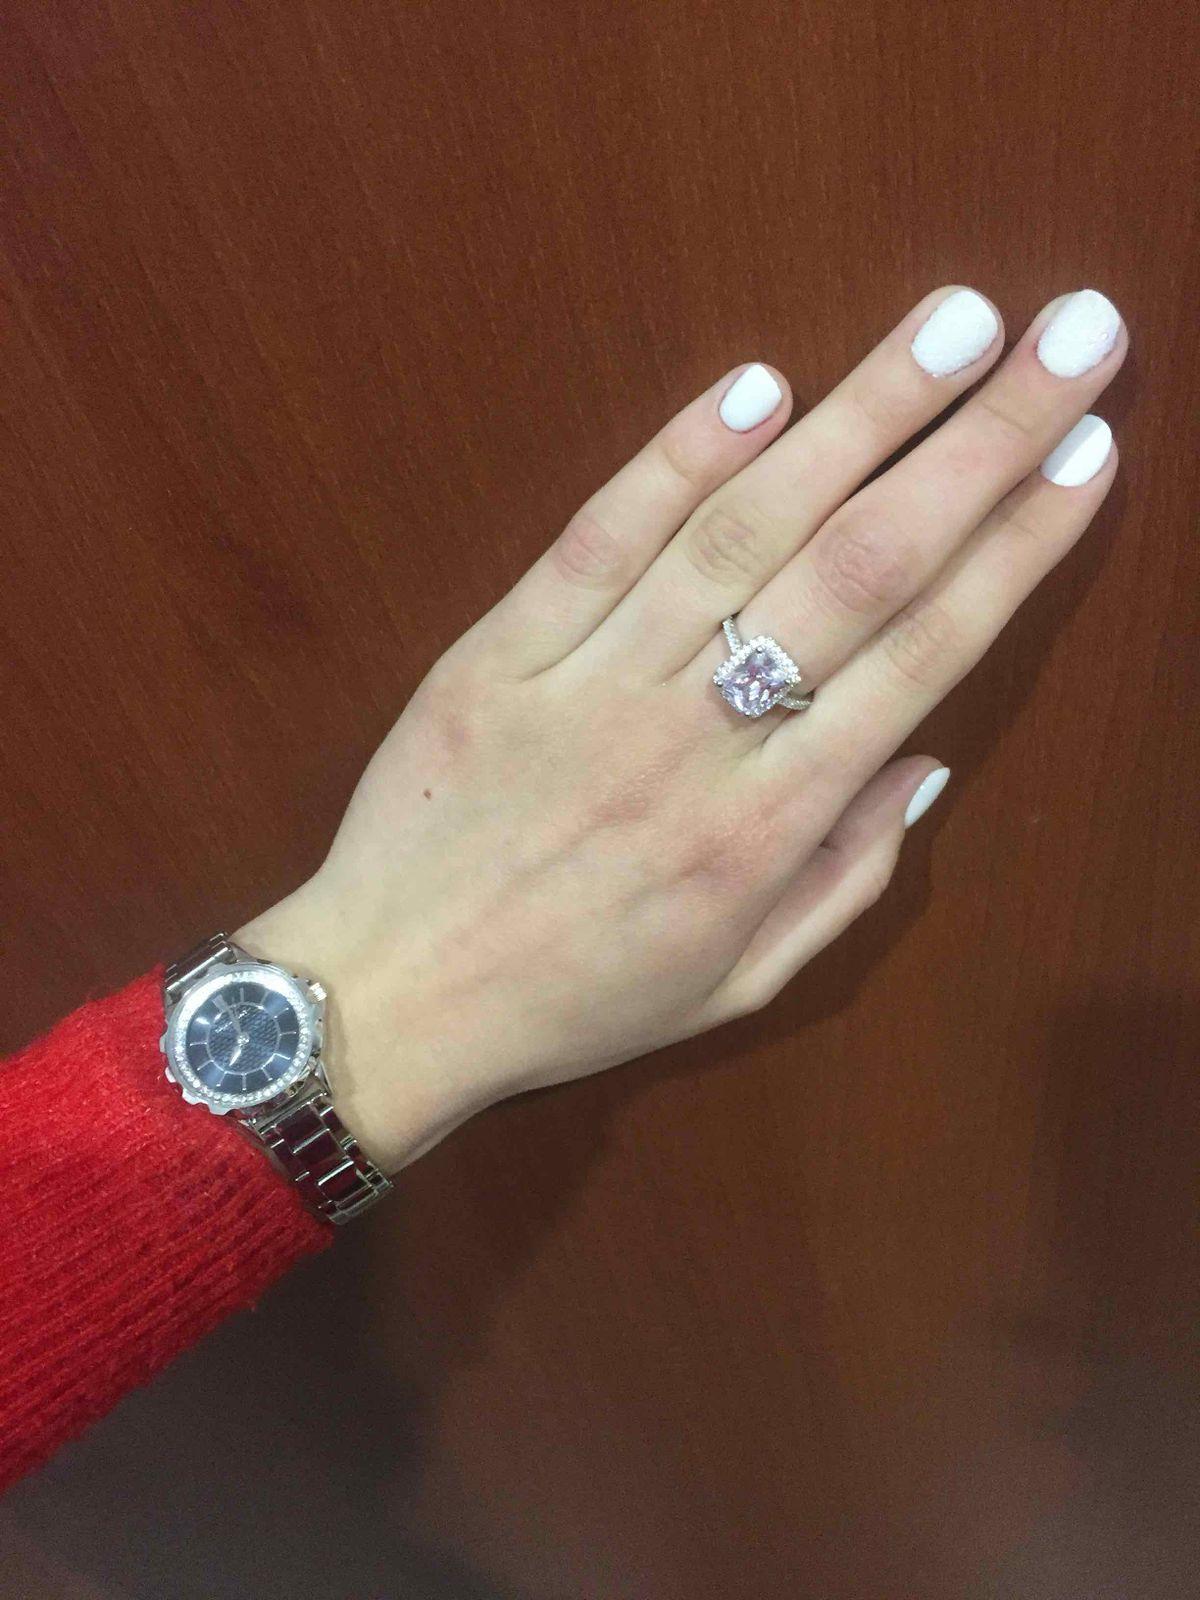 Кольцо моей мечты😍